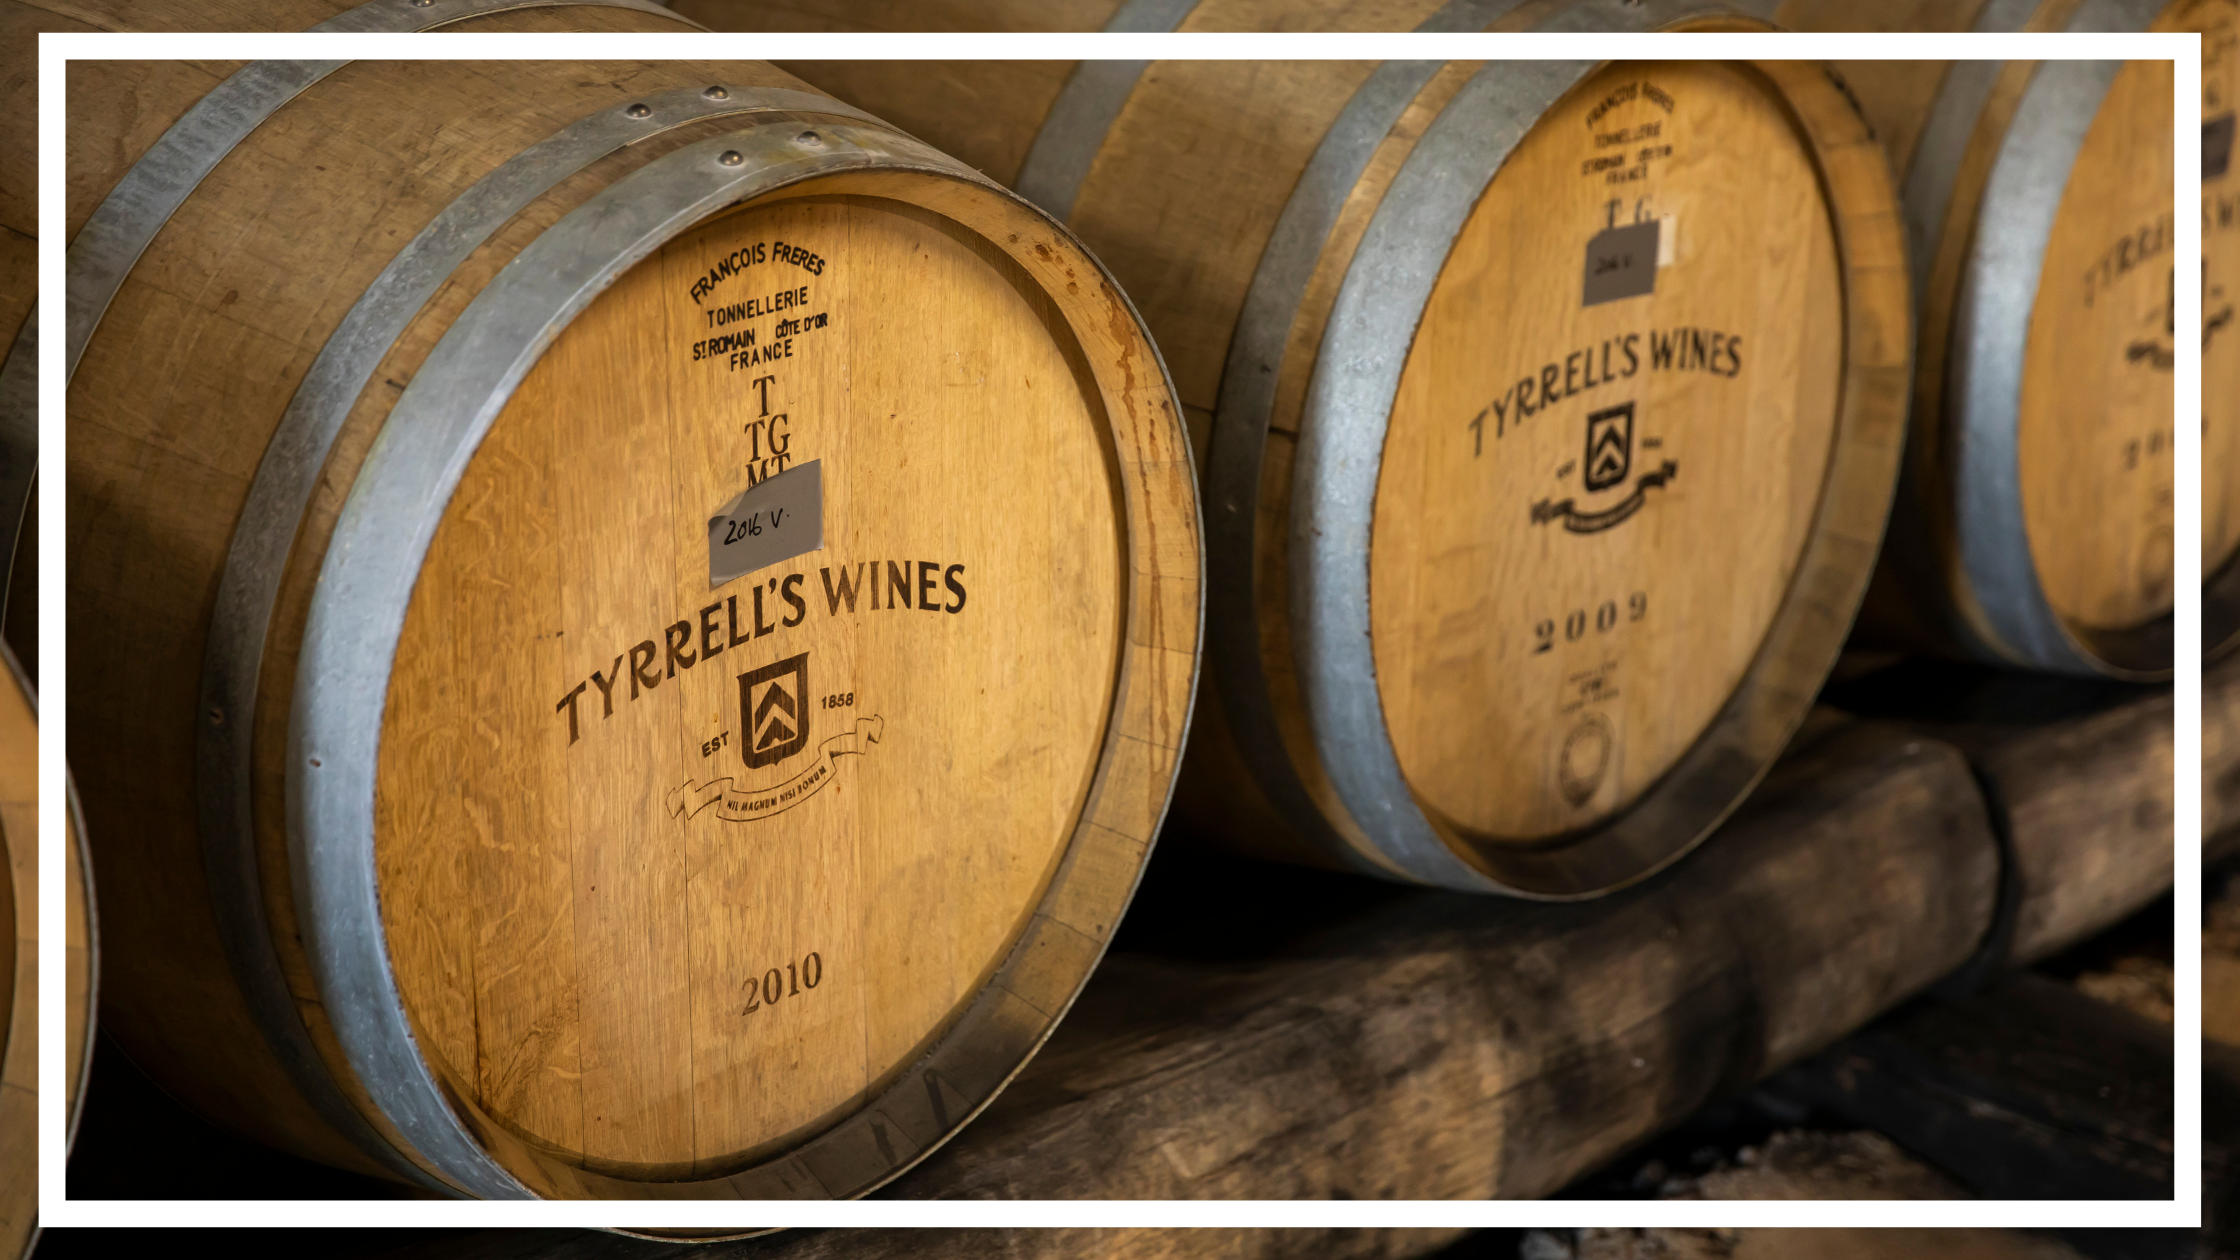 Onsite wine production at Tyrrells, Pokolbin by Destination NSW